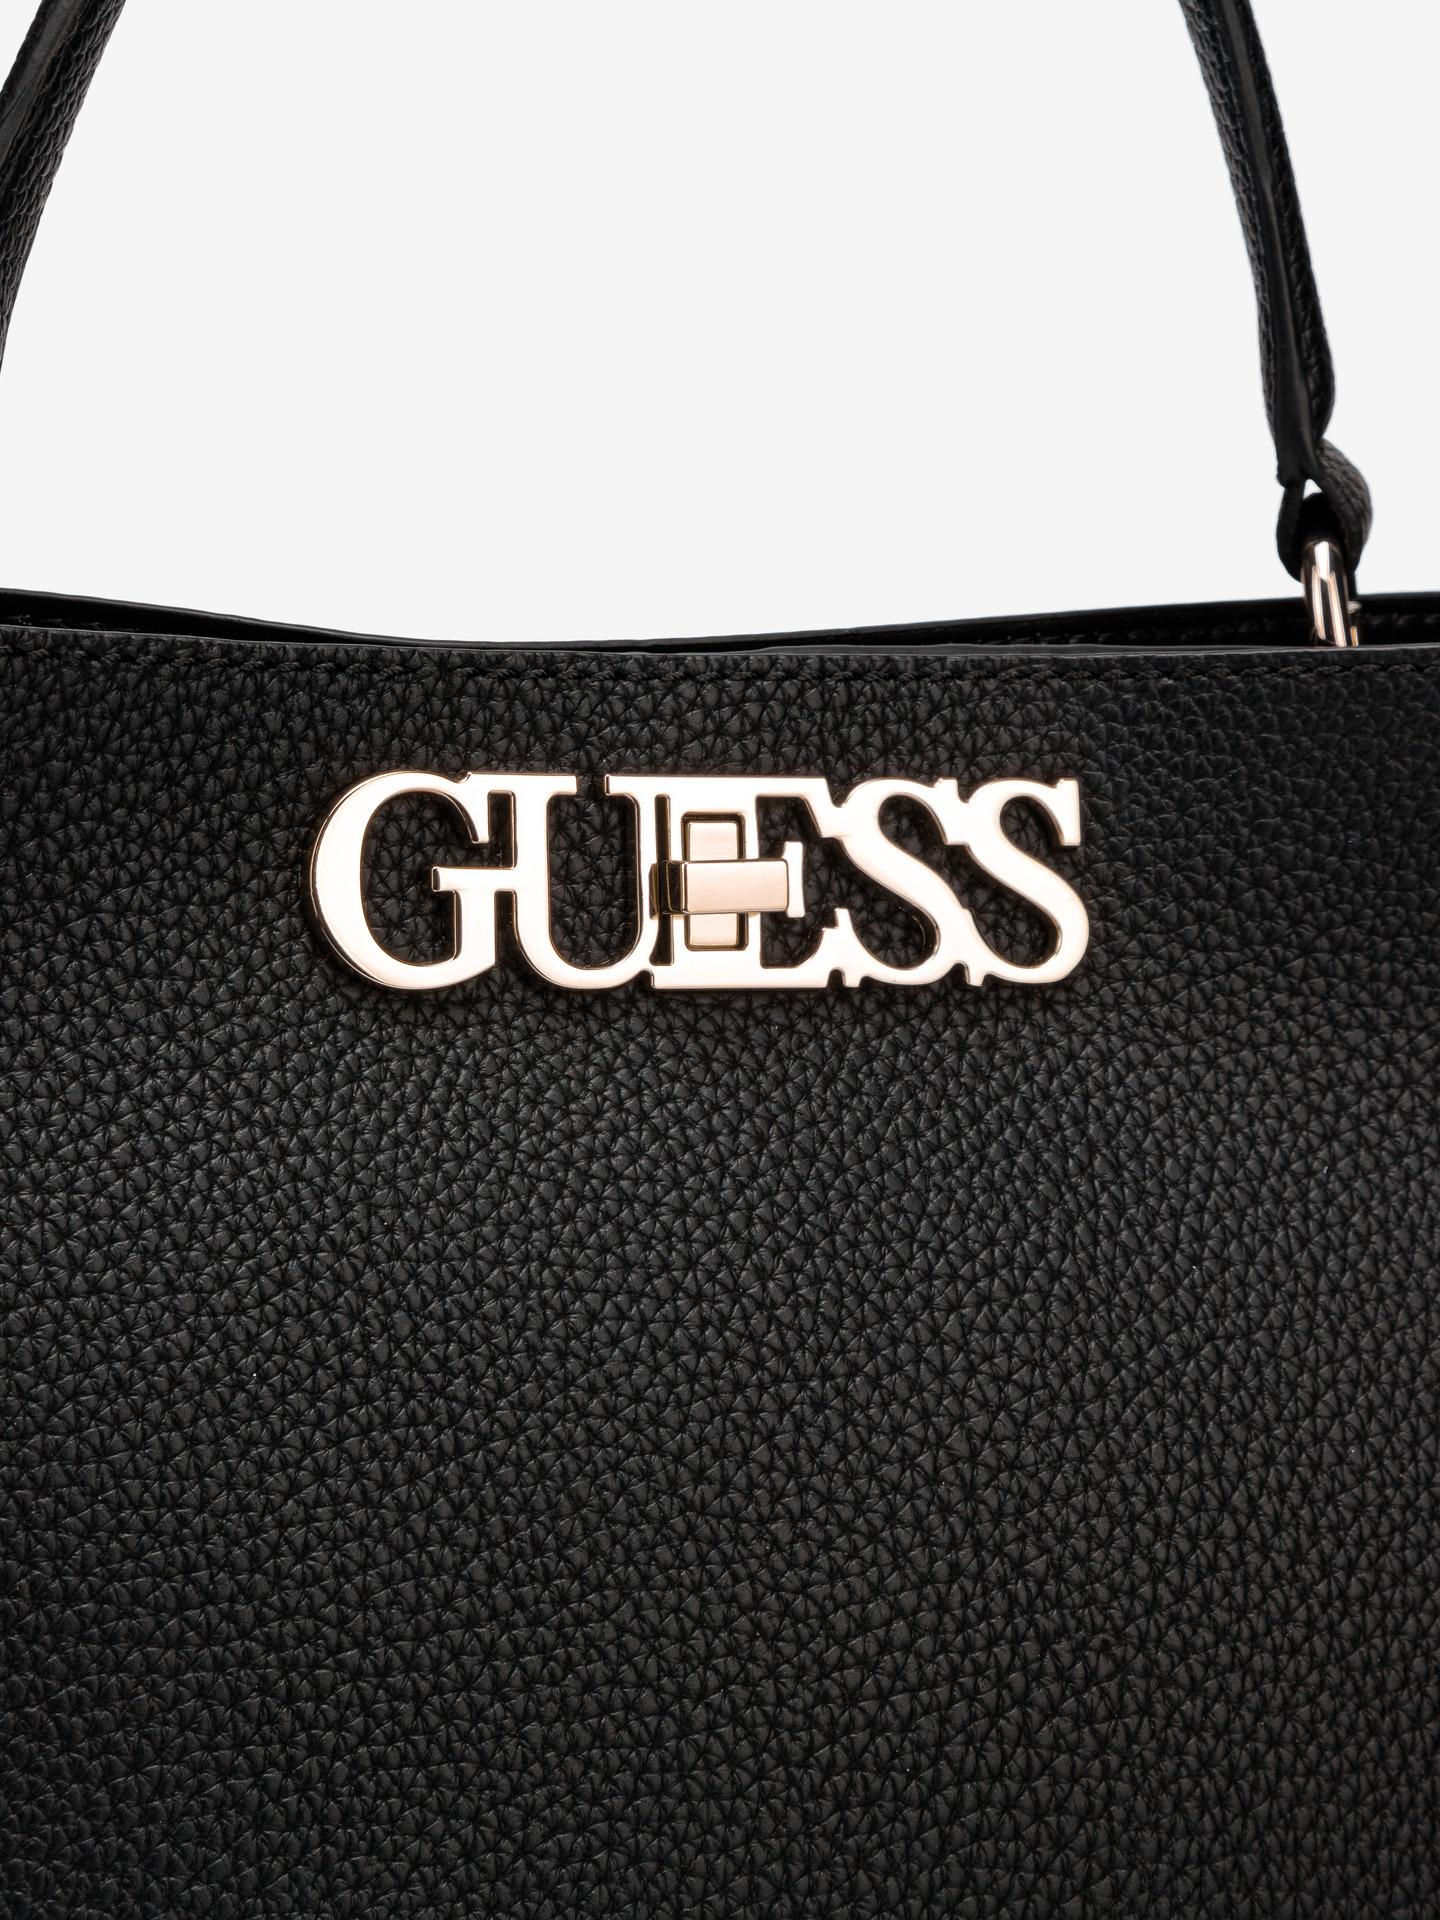 Guess black handbag Uptown Chic Large